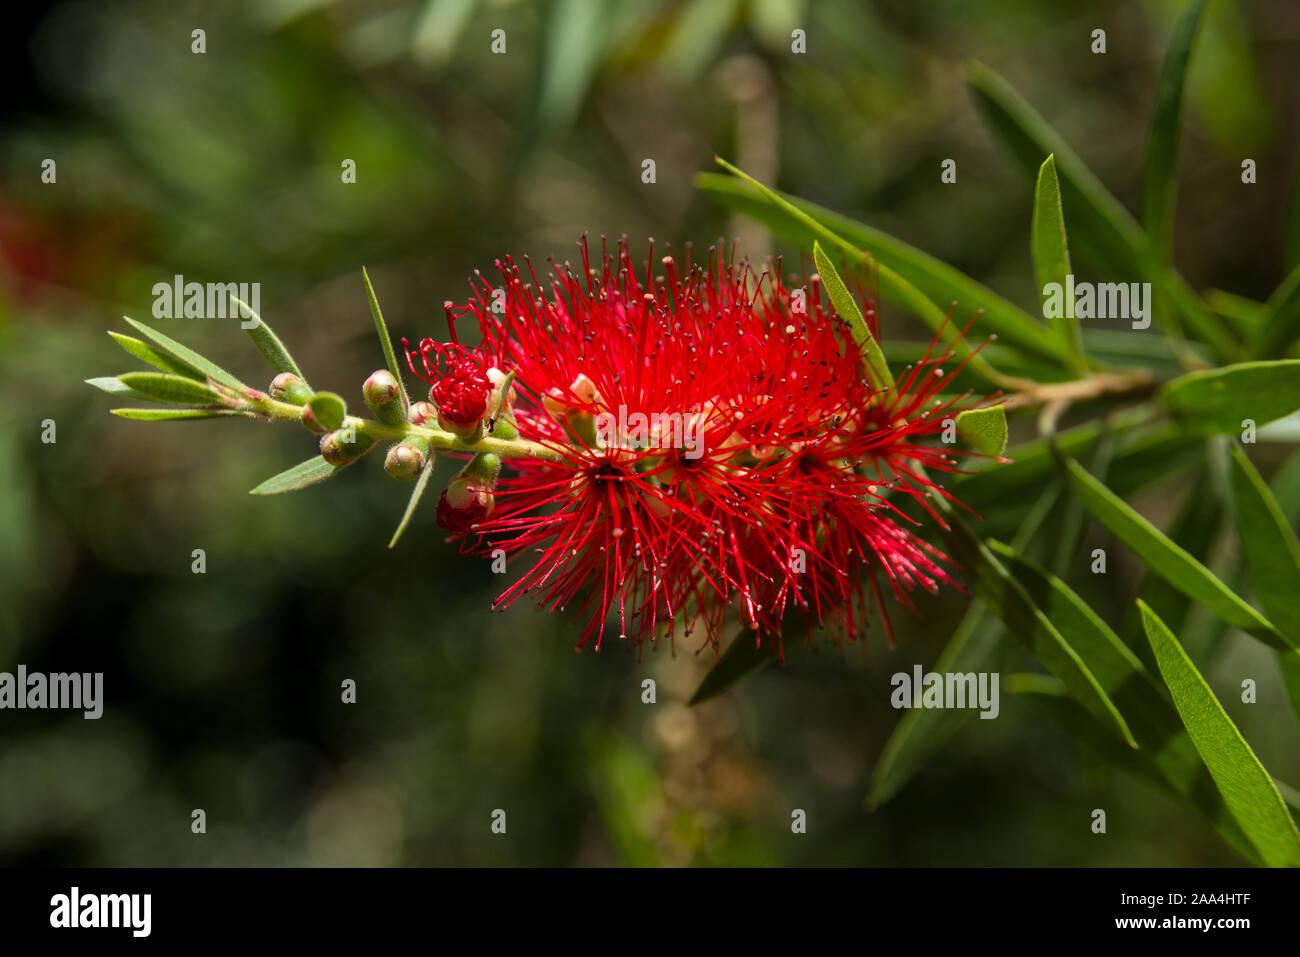 Callistemon viminalis or weeping bottlebrush tree showing red inflorescences and leaves, Kenya, East Africa Stock Photo